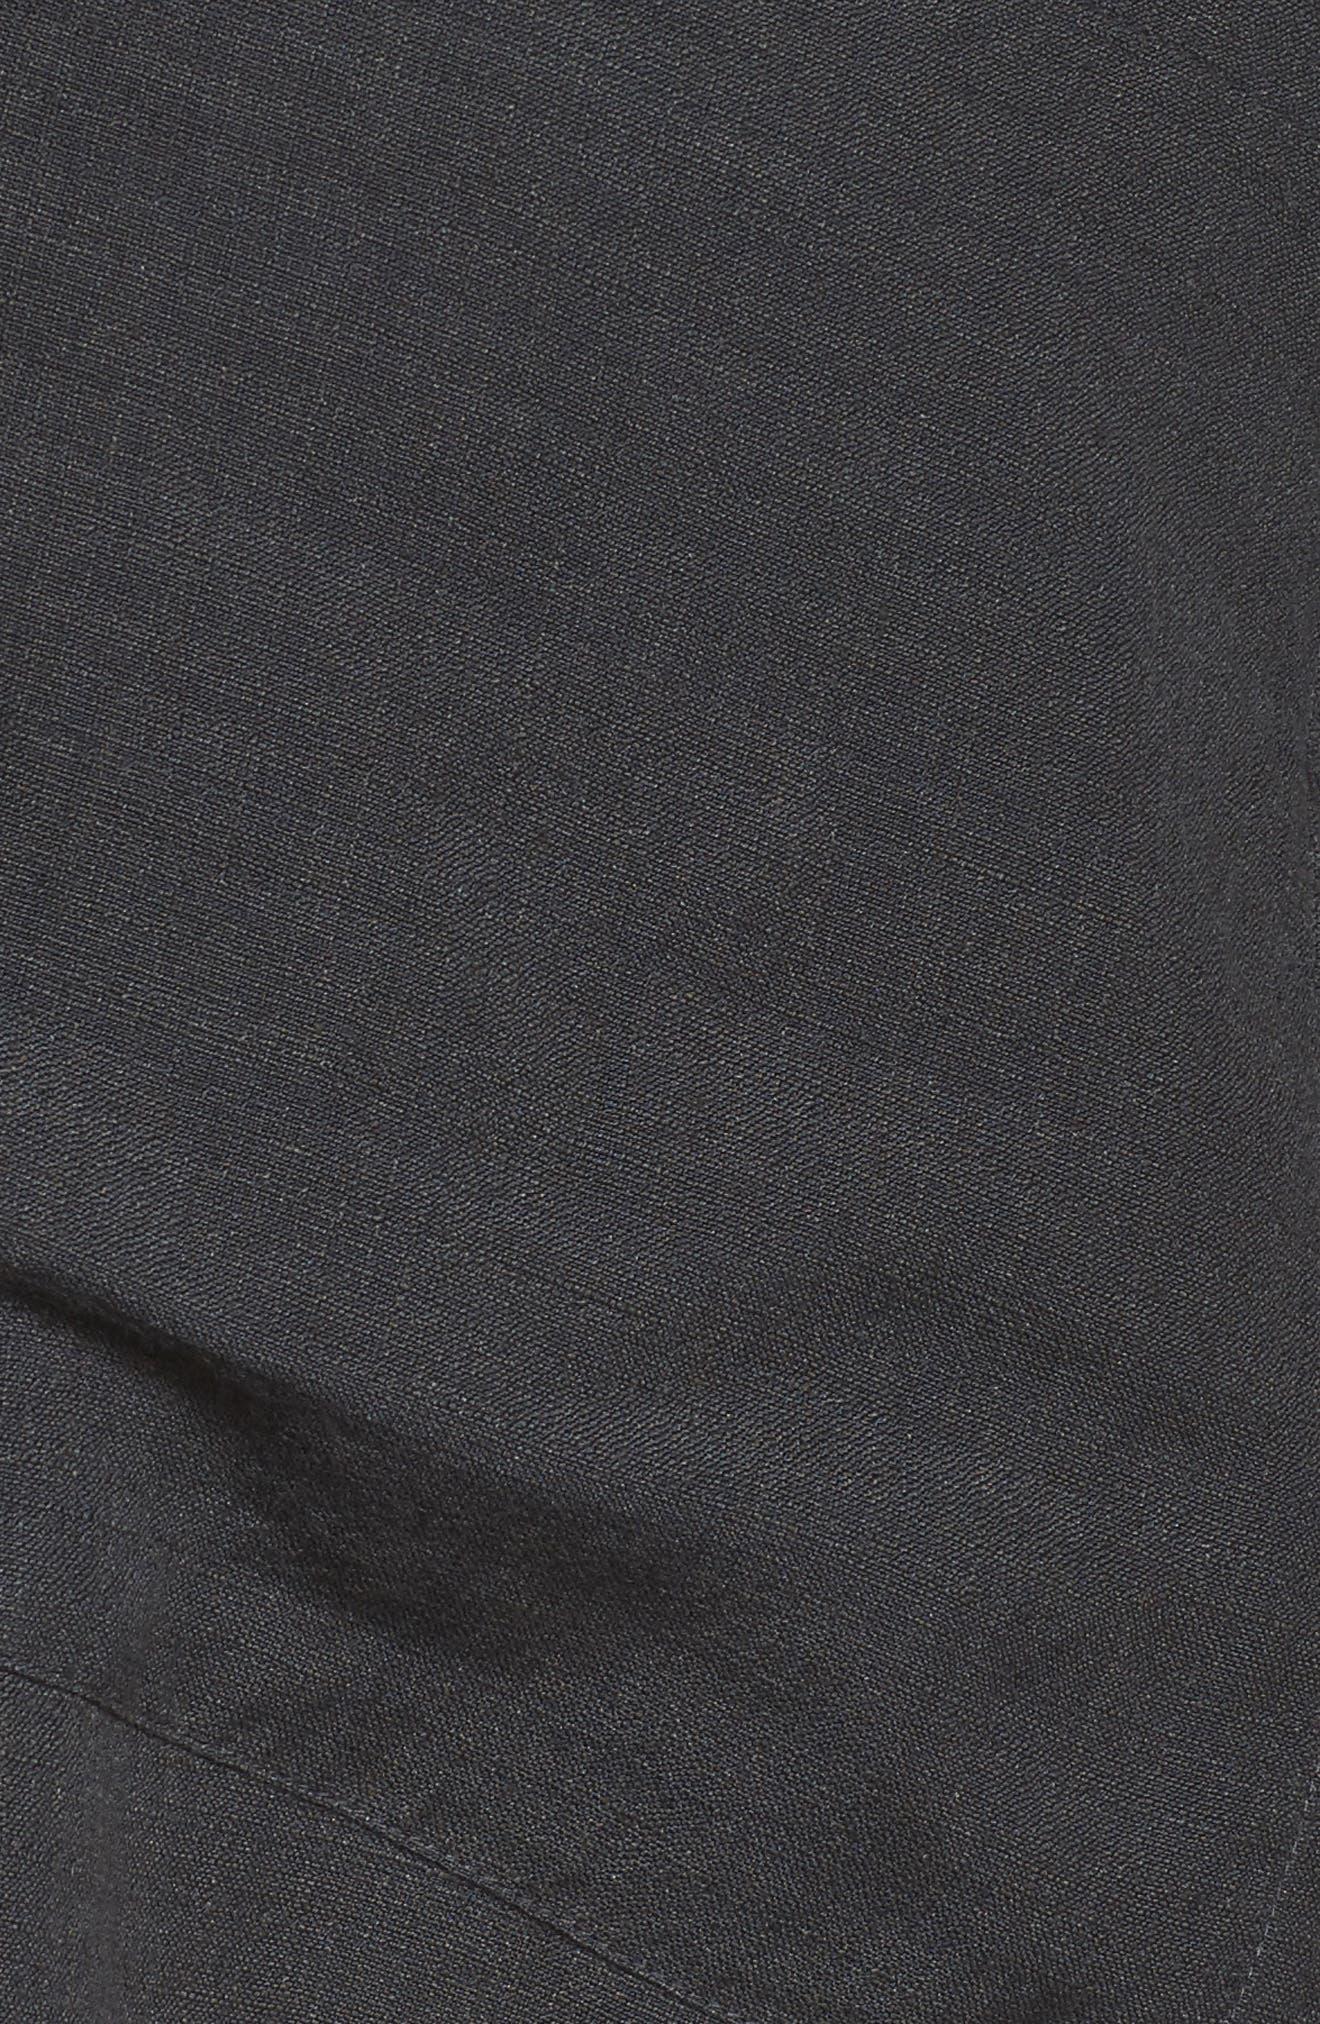 Woven Linen Blend Blouse,                             Alternate thumbnail 5, color,                             025